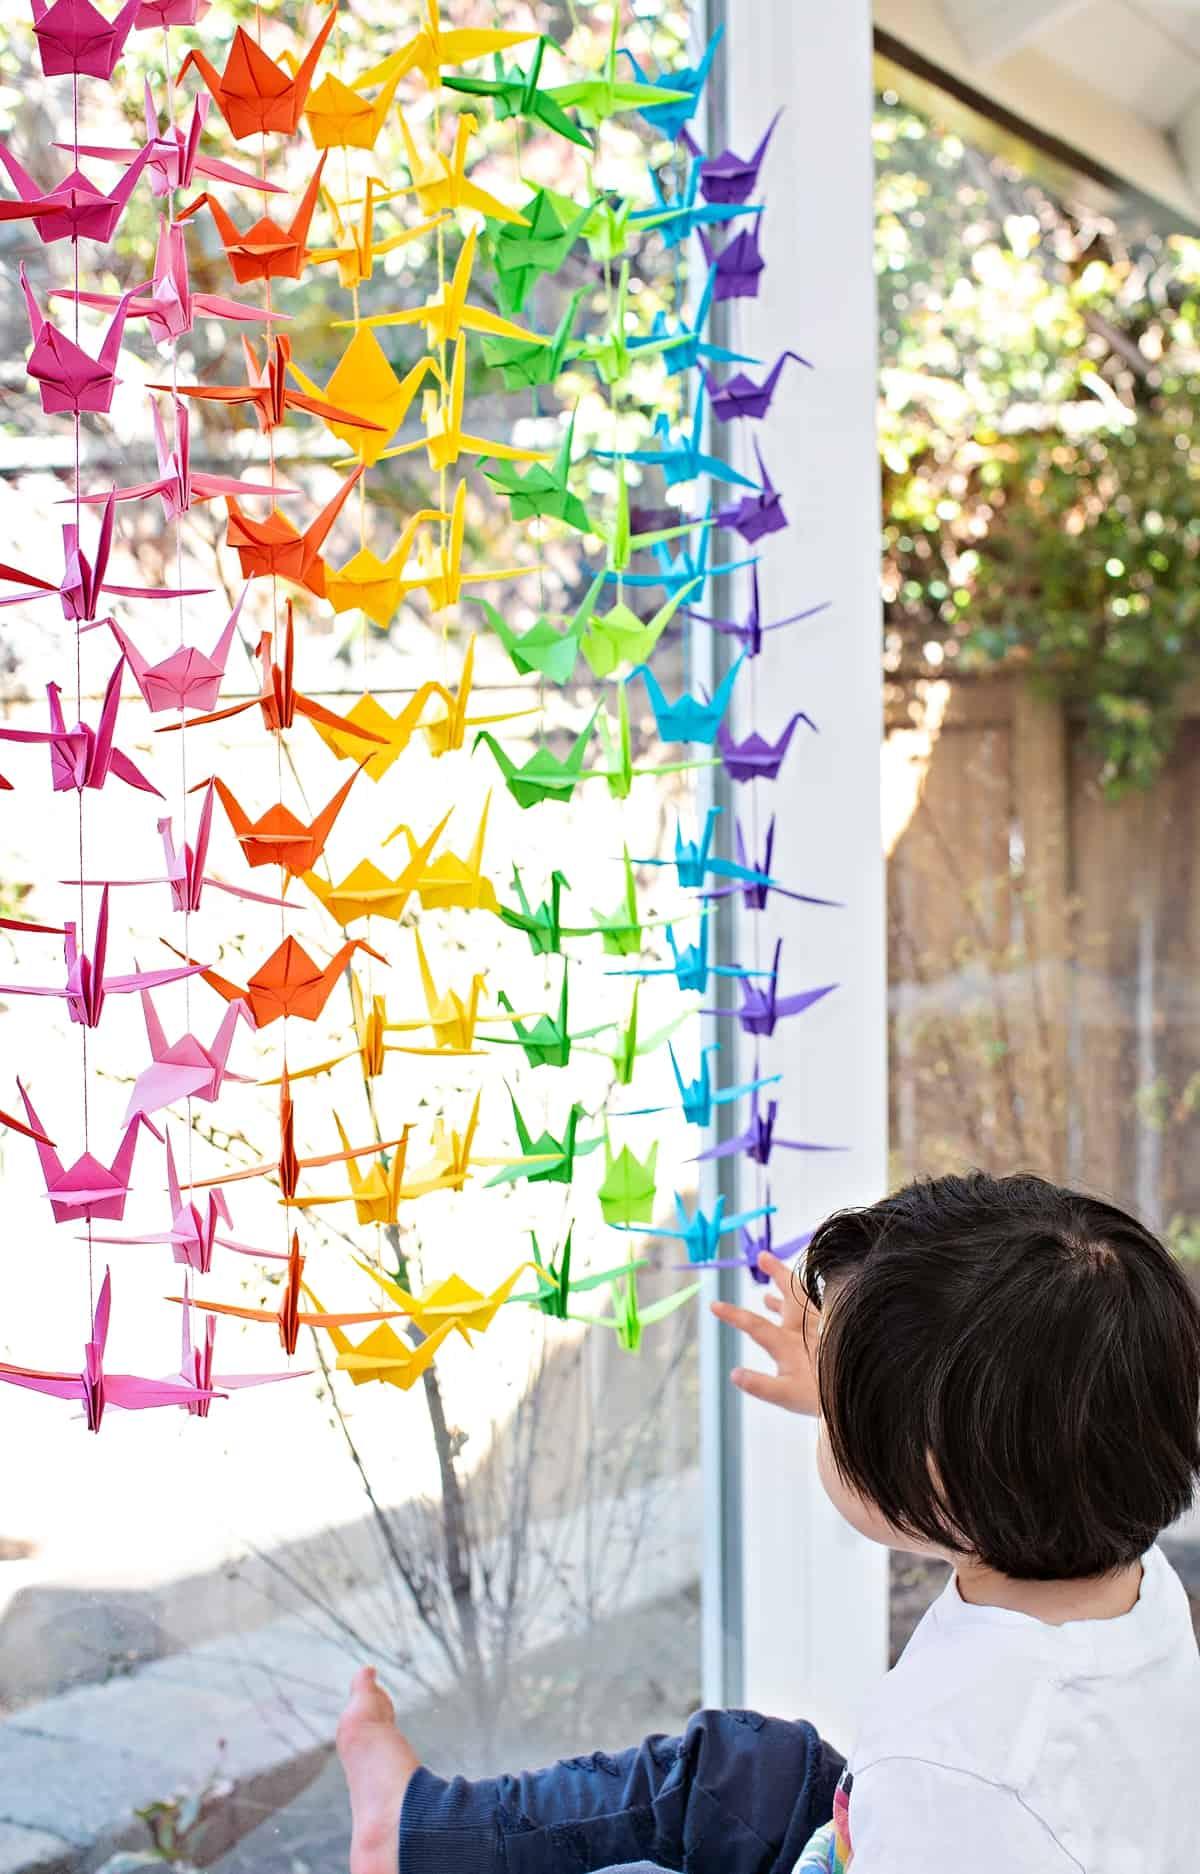 One million paper cranes project community coronavirus project.